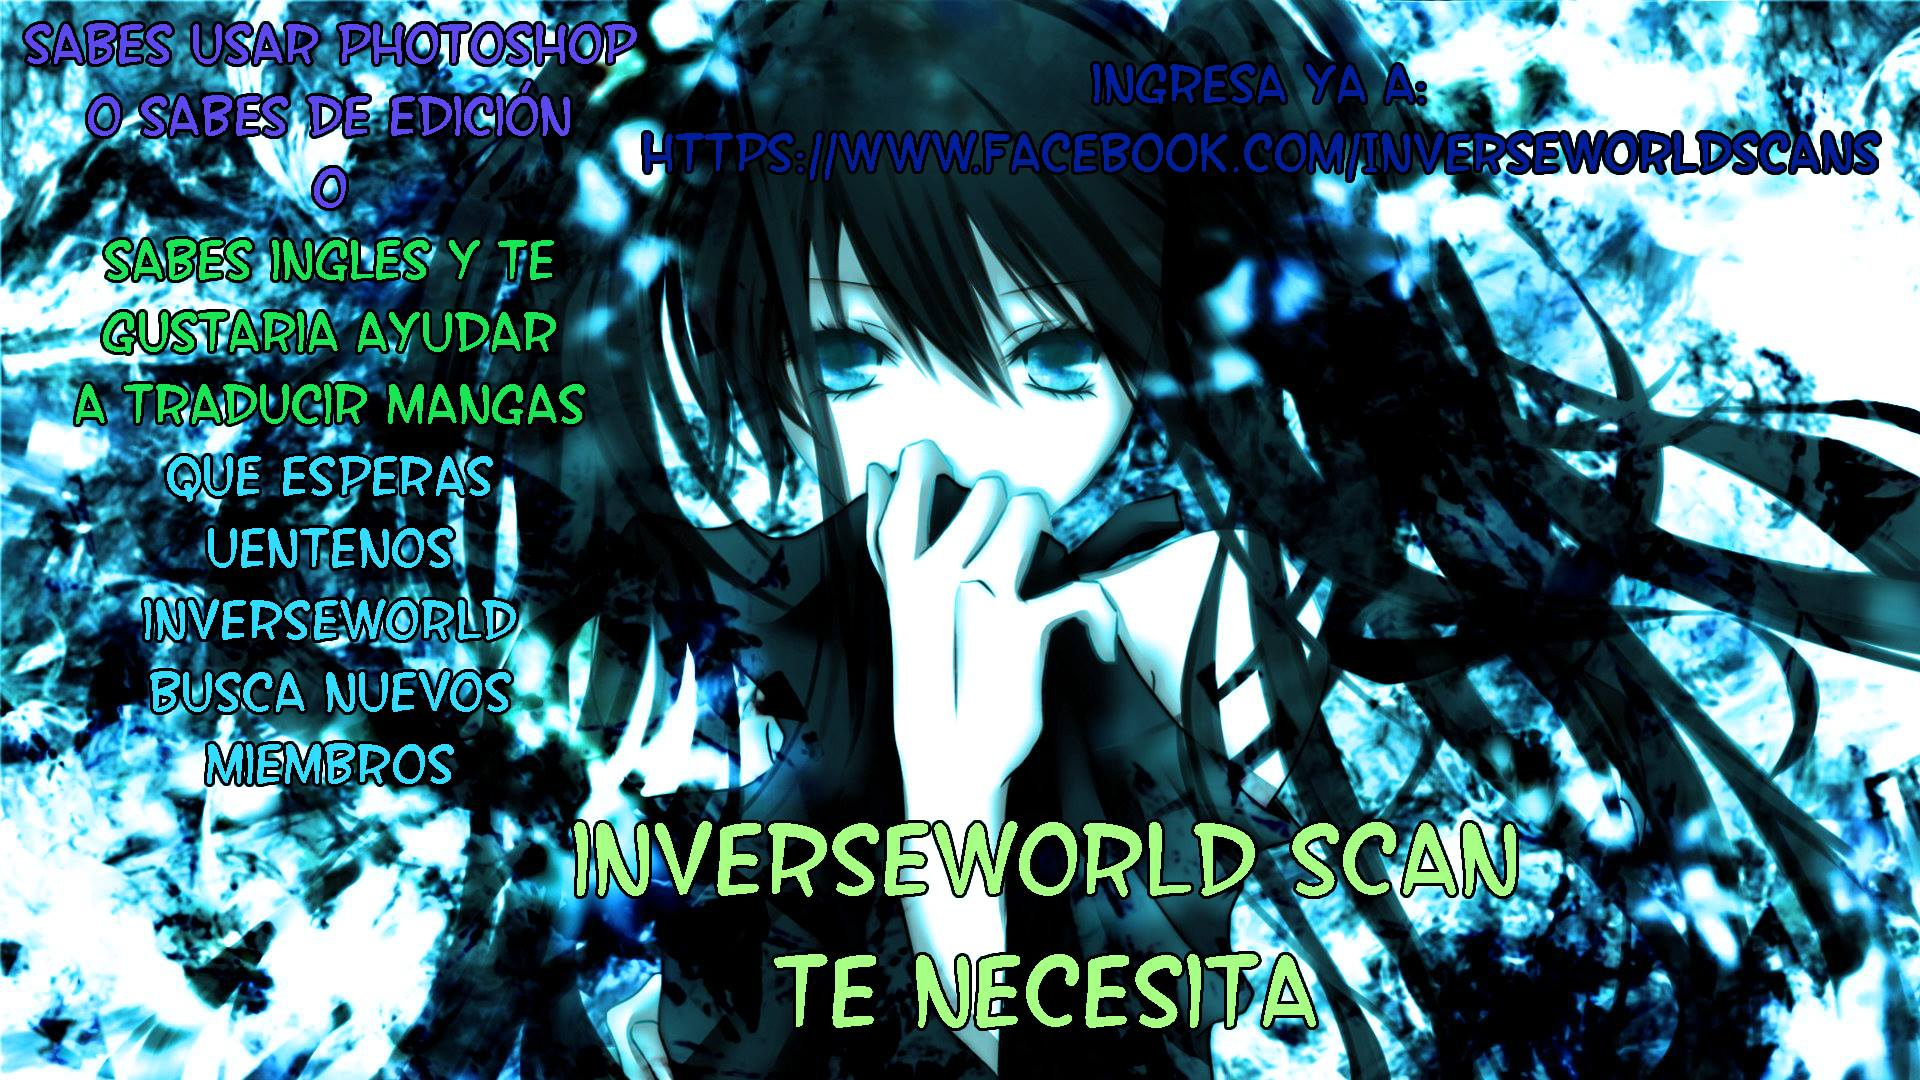 https://c5.mangatag.com/es_manga/18/16210/415319/716fd5eae768d31abd8ac3a14e9716f5.jpg Page 2